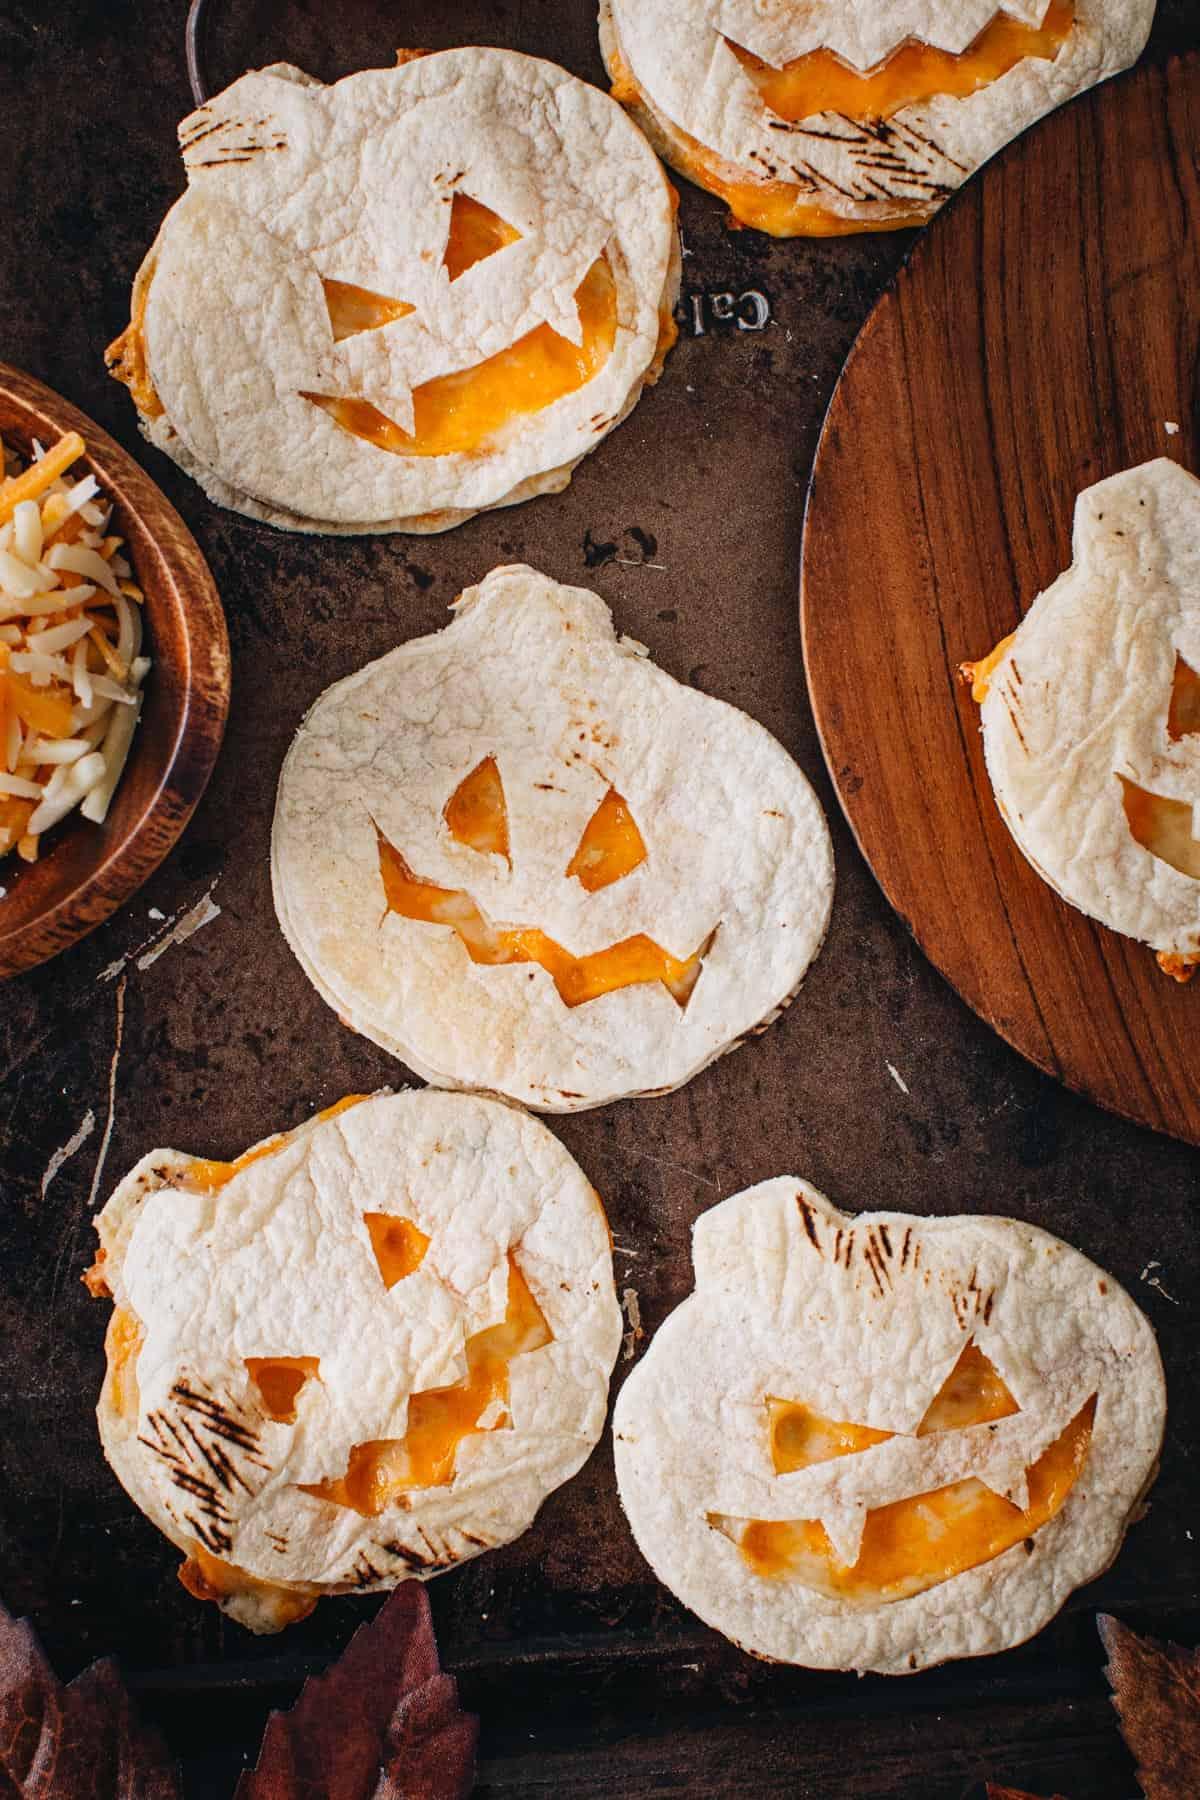 Pumpkin oven quesadillas on a baking sheet.